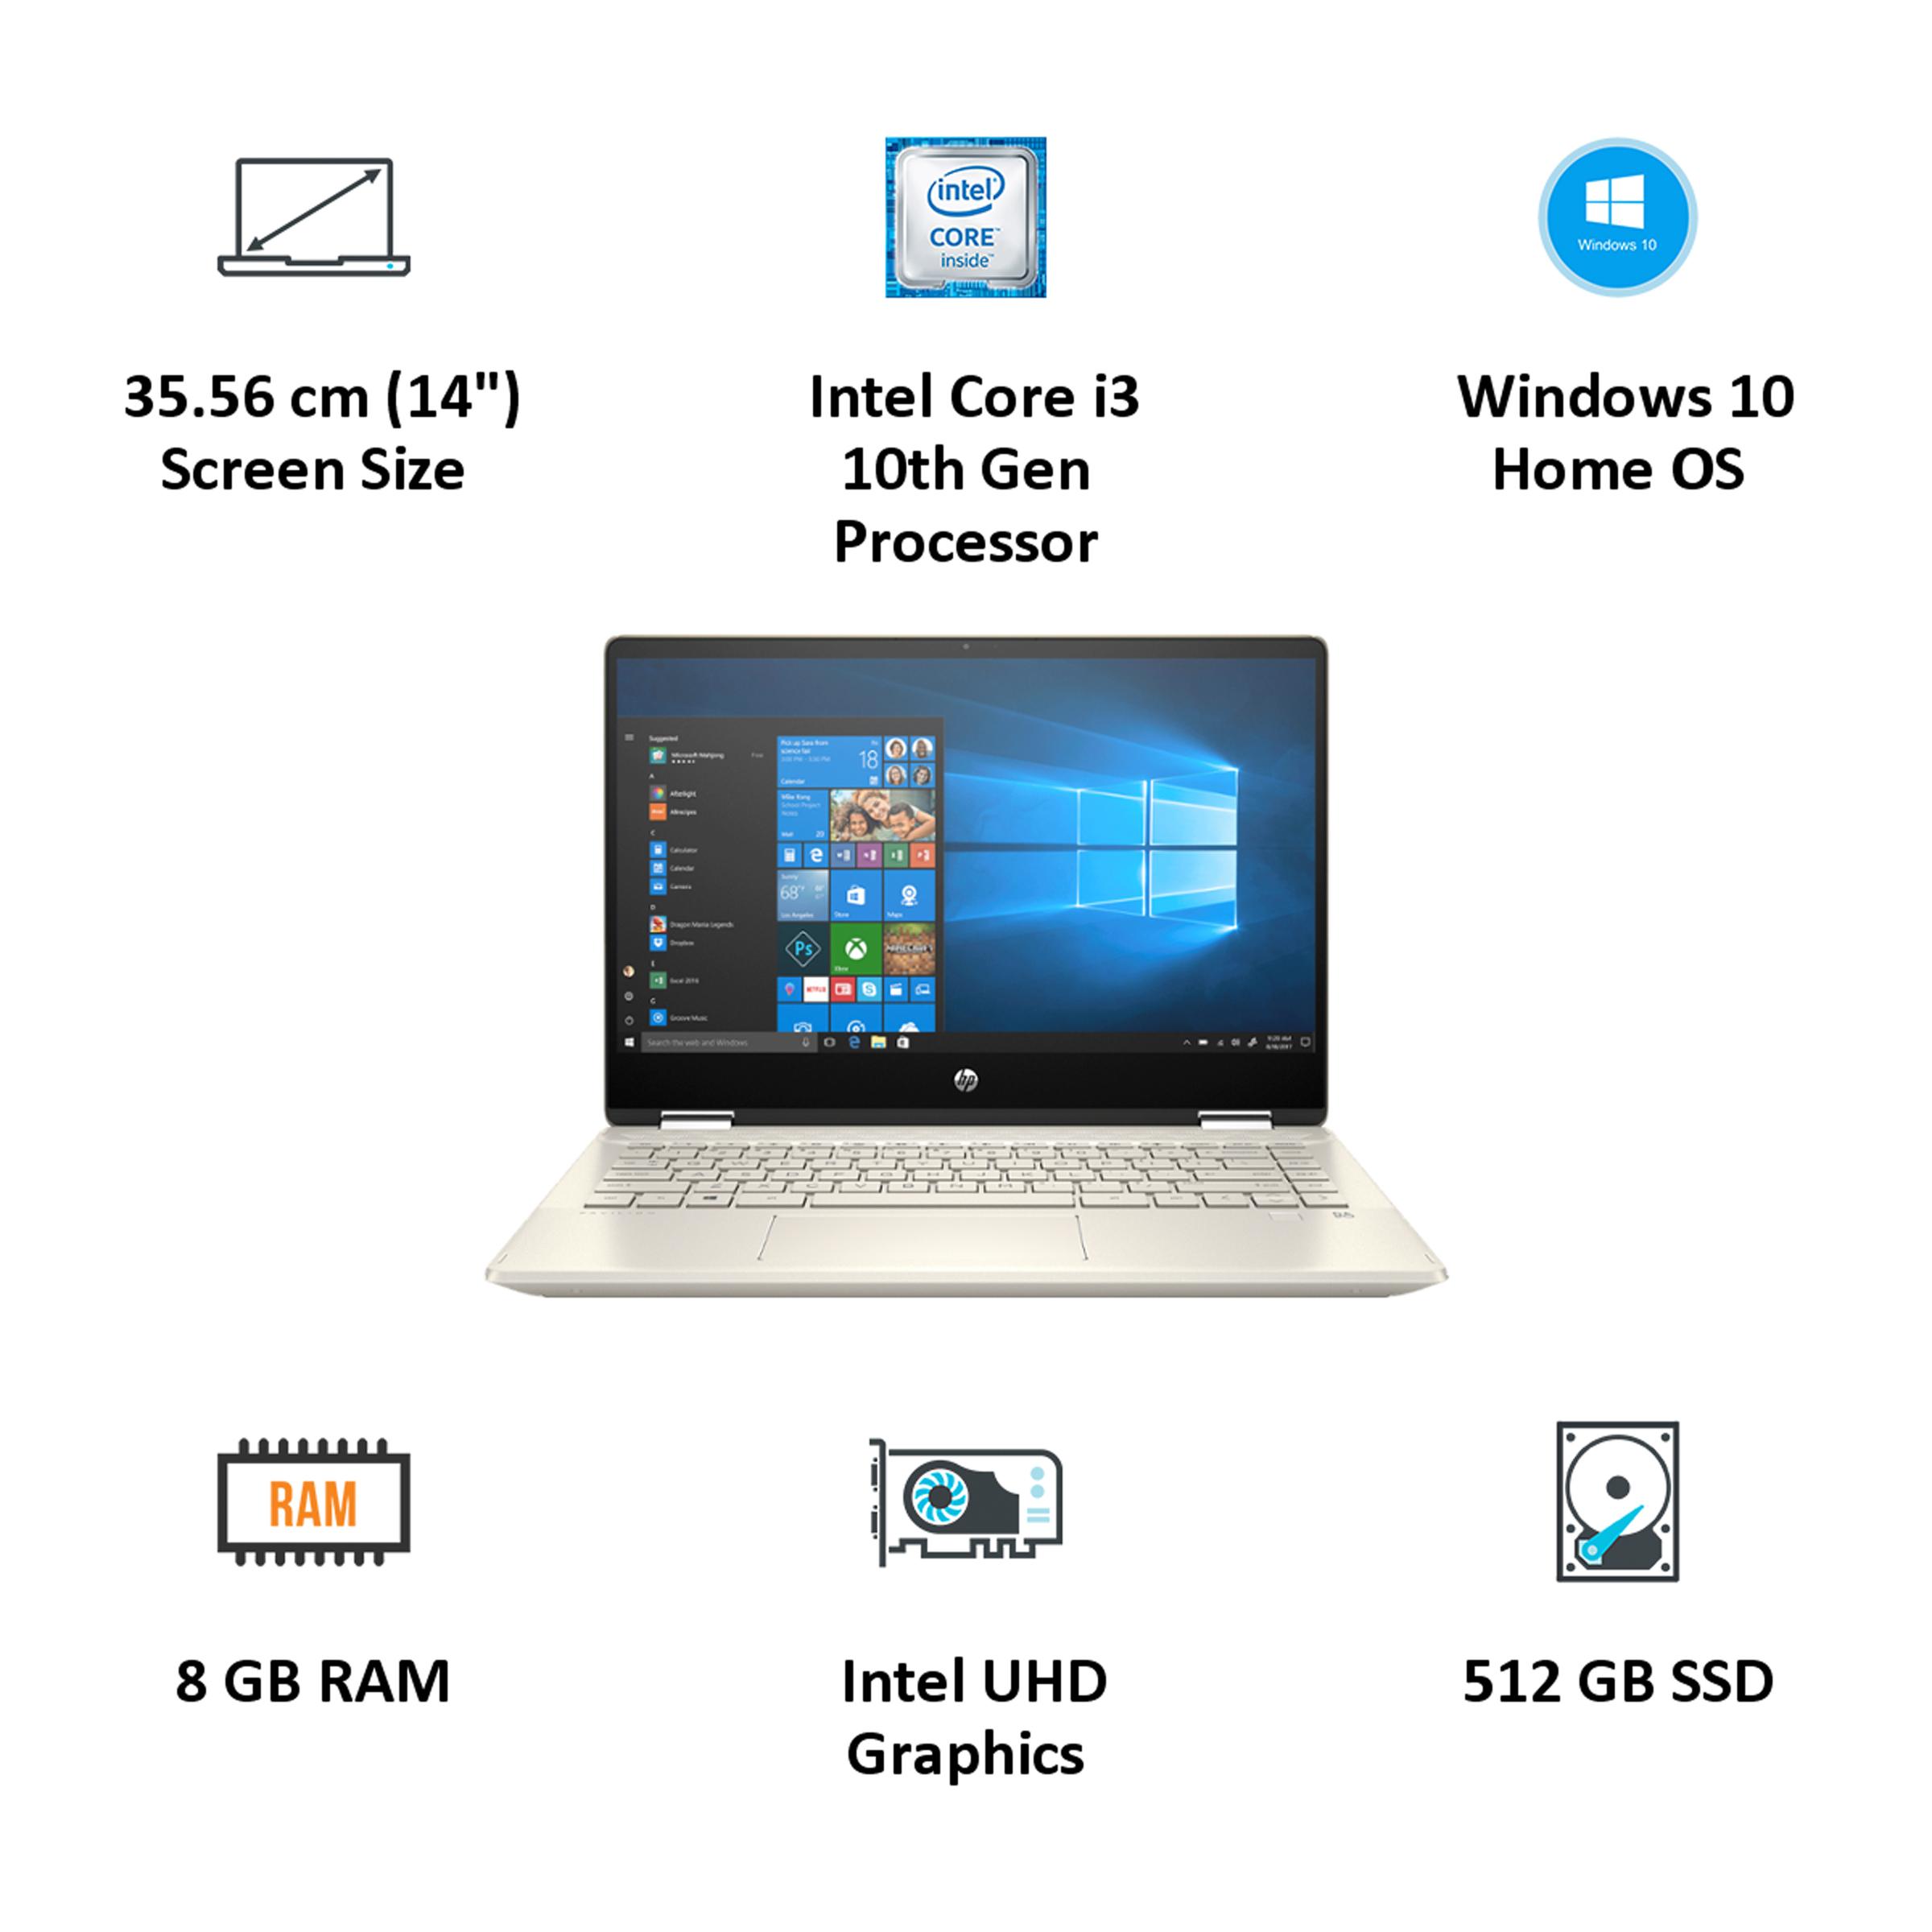 HP Pavilion x360 Convertible 14-dh1502TU (401S0PA#ACJ) Core i3 10th Gen Windows 10 Home 2-in-1 Laptop (8GB RAM, 512GB SSD, Intel UHD Graphics, MS Office, 35.56cm, Warm Gold)_4